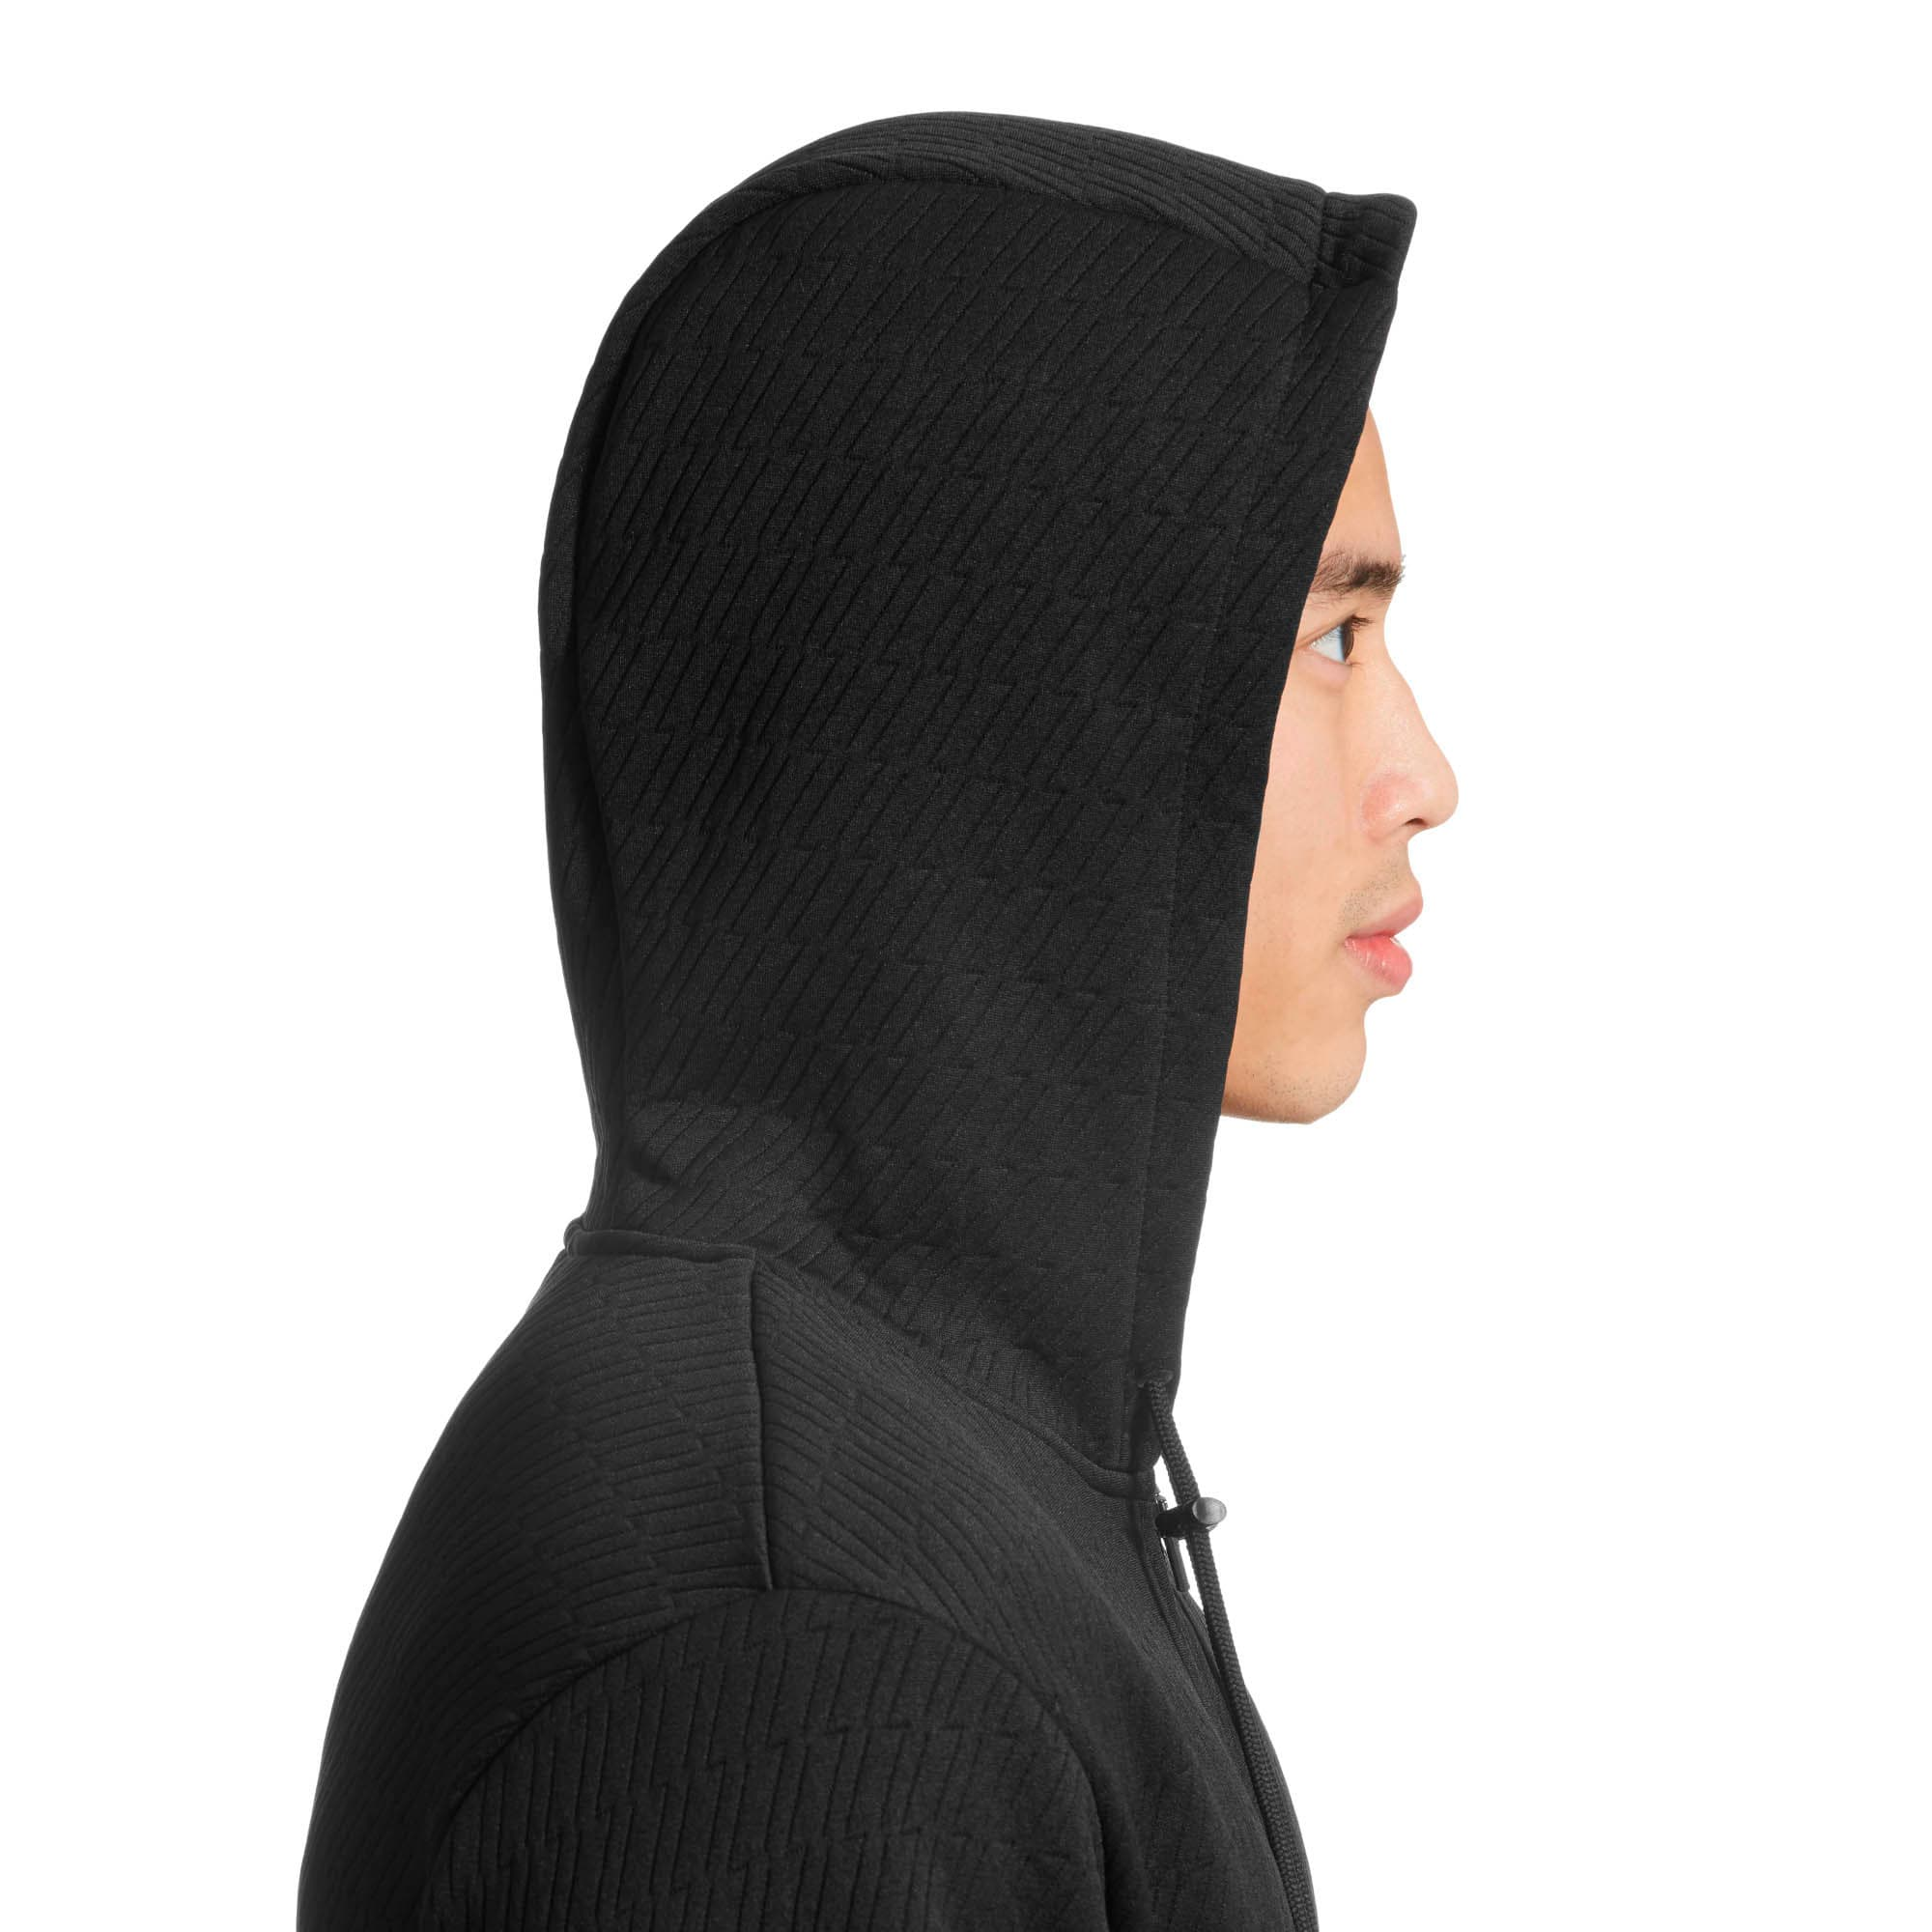 Thumbnail 3 of VENT Hooded Jacket, Puma Black, medium